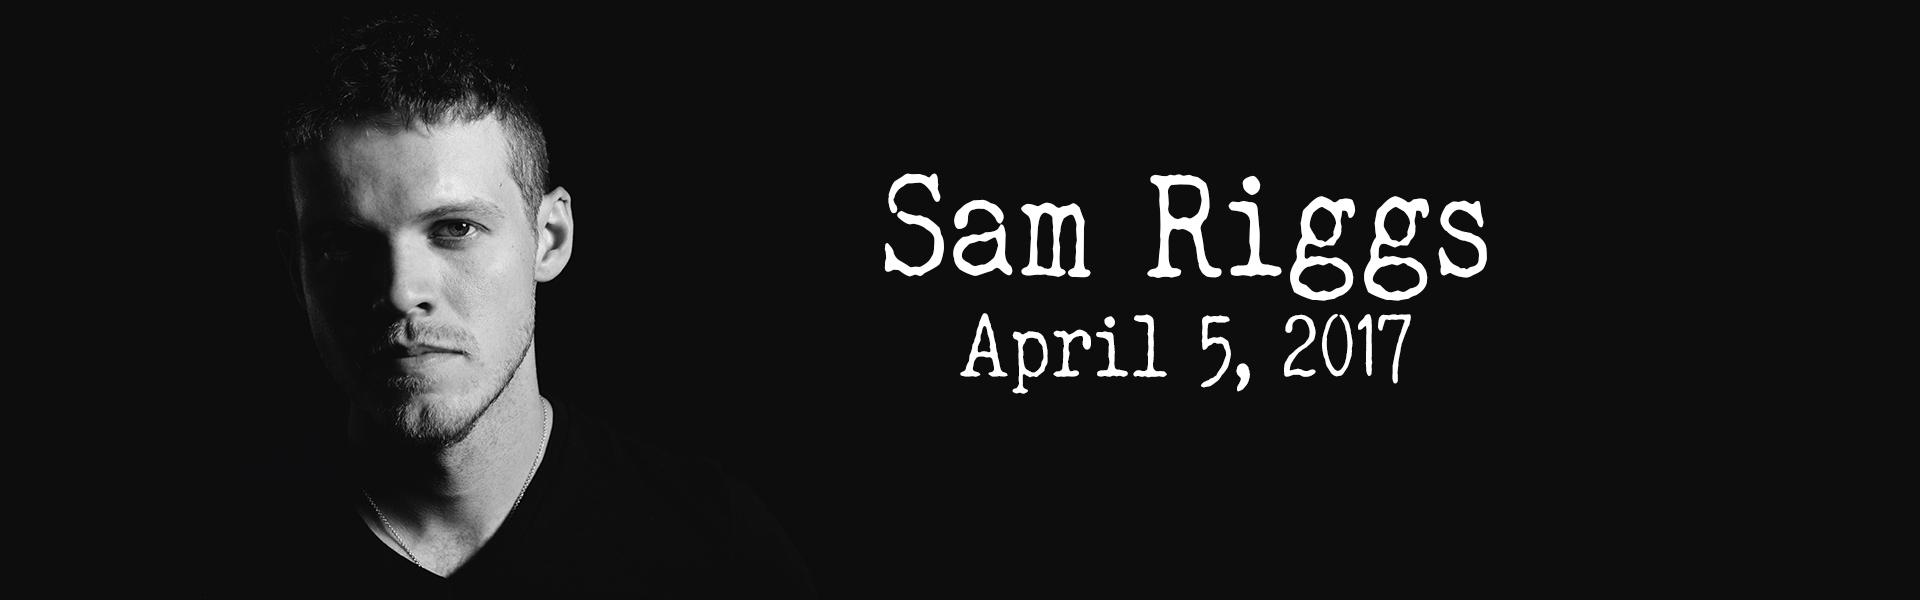 Sam-Riggs-Banner